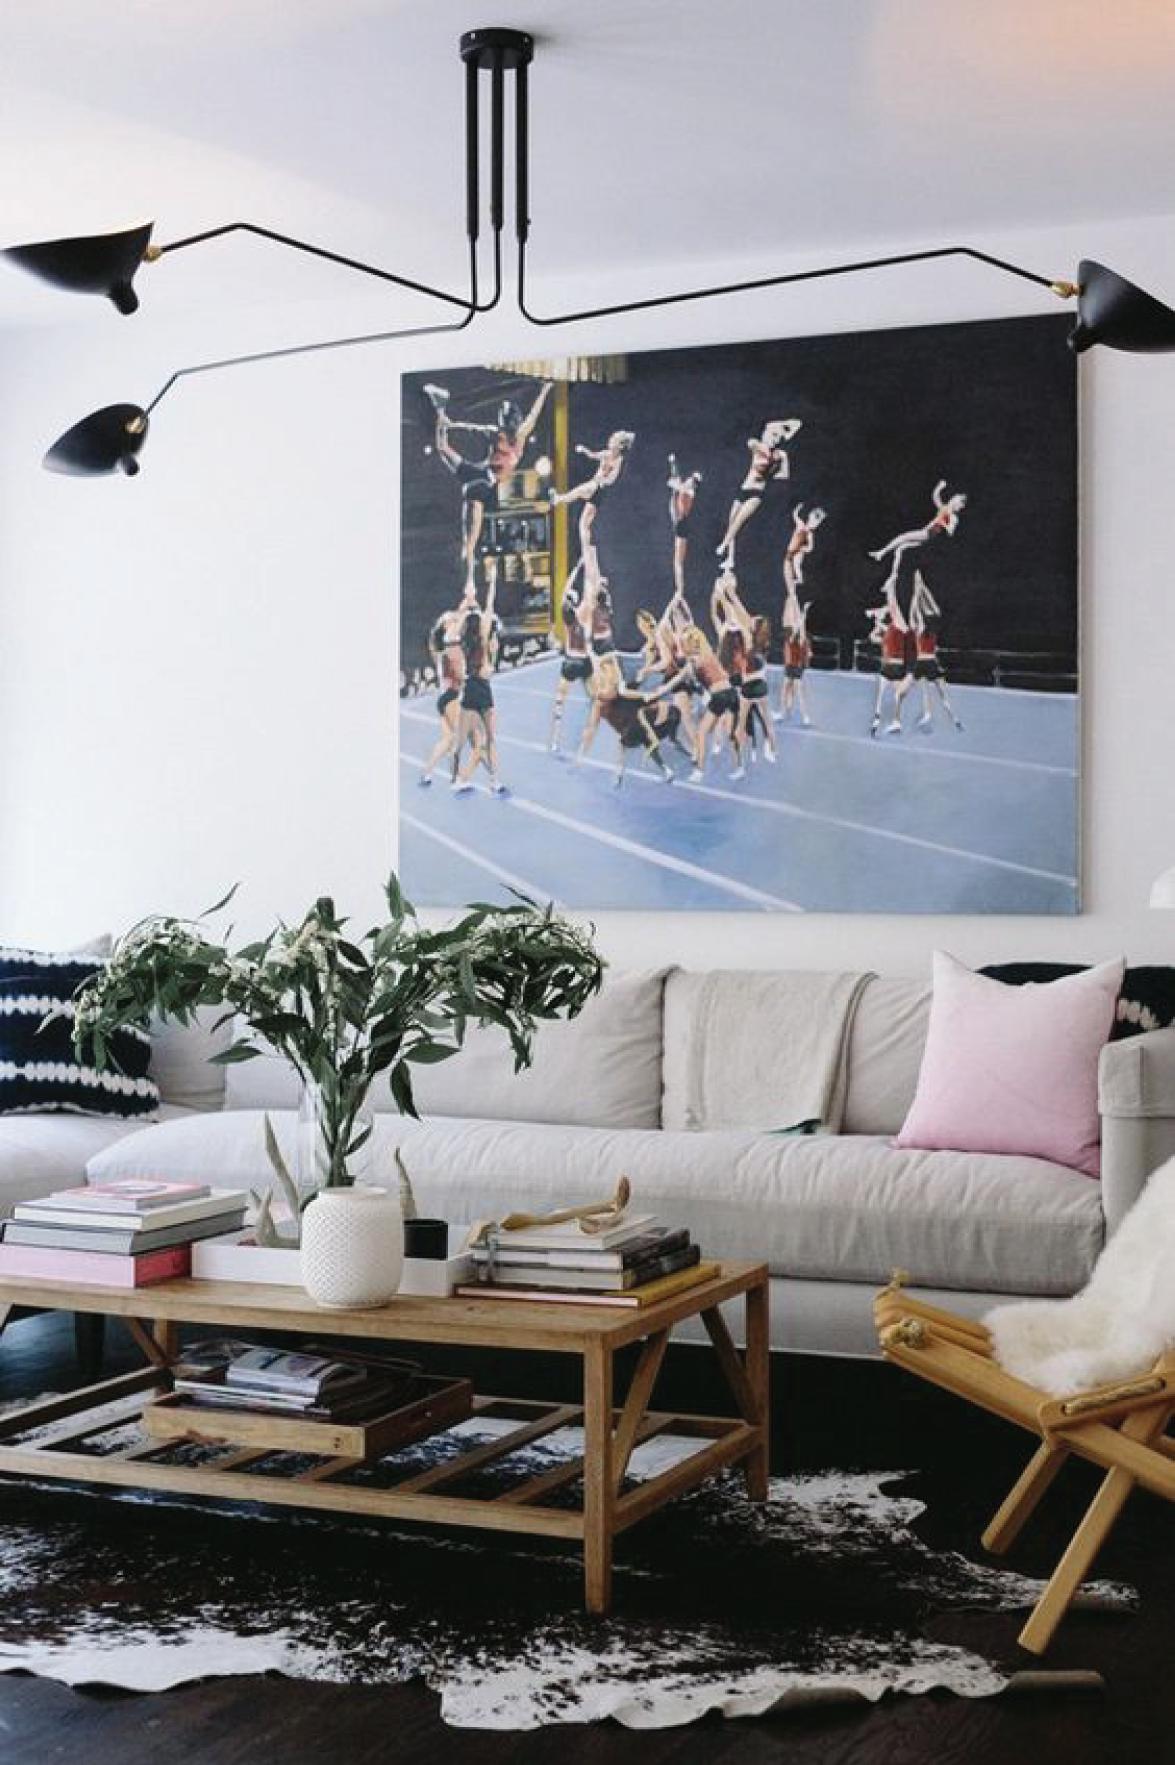 image via  crowell + co. interiors